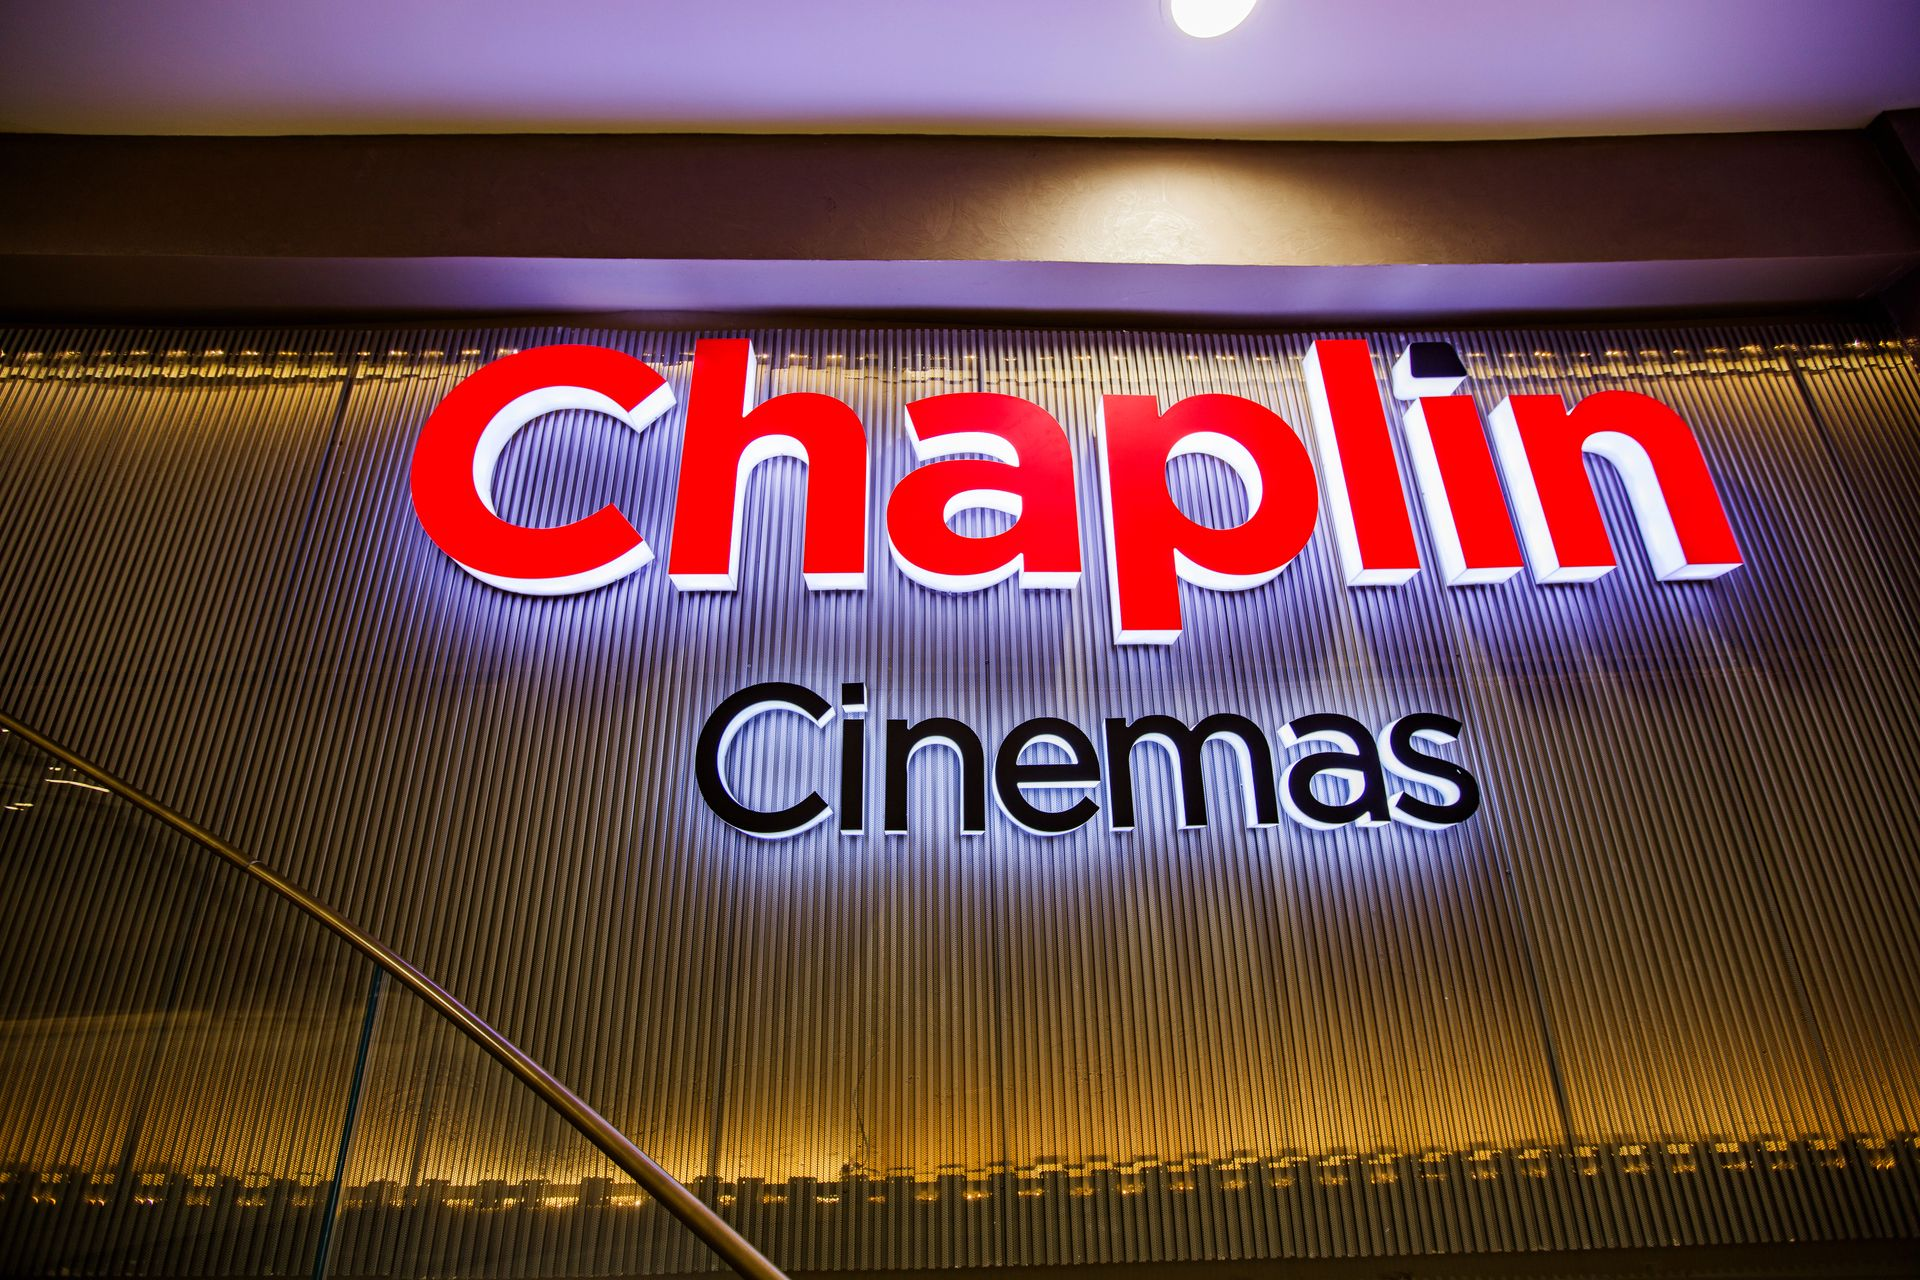 CHAPLIN CINEMAS